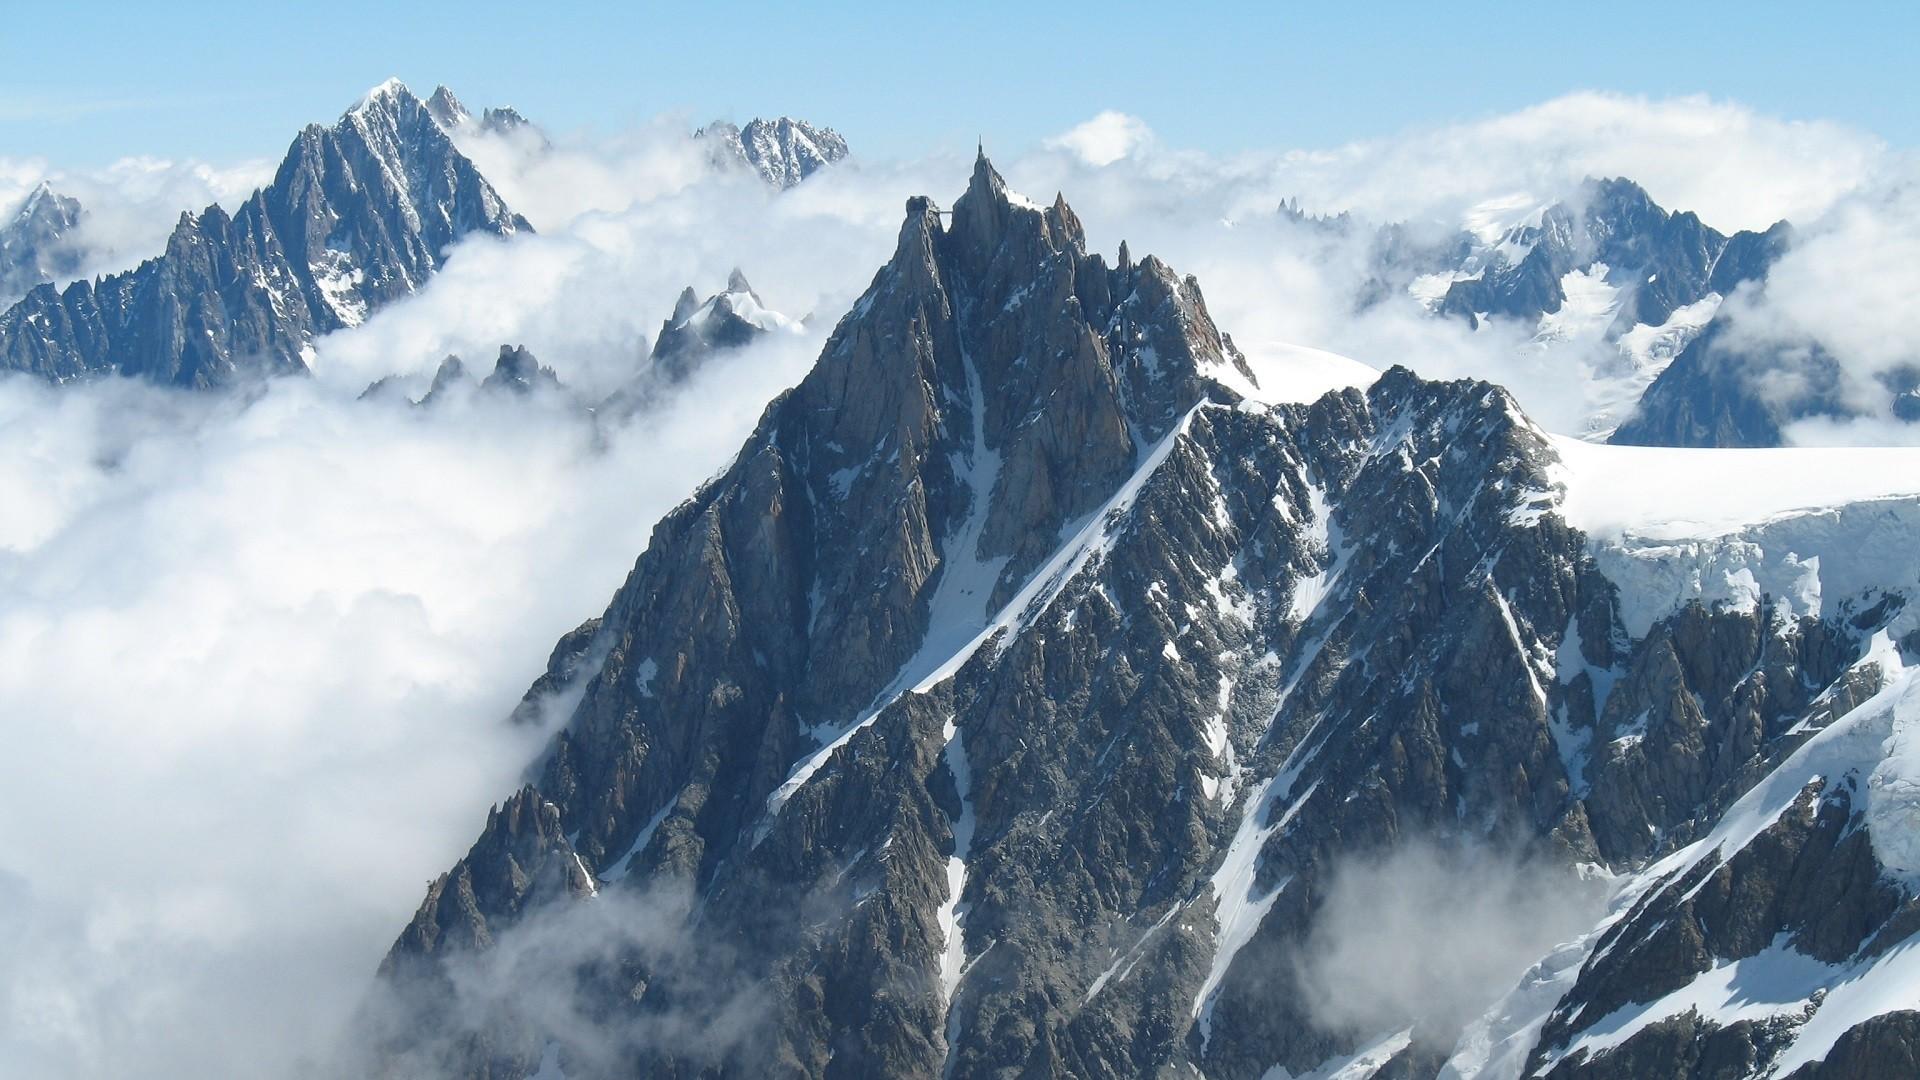 1080P HD Mountain Wallpaper, 39+ HD 1080P Mountain .